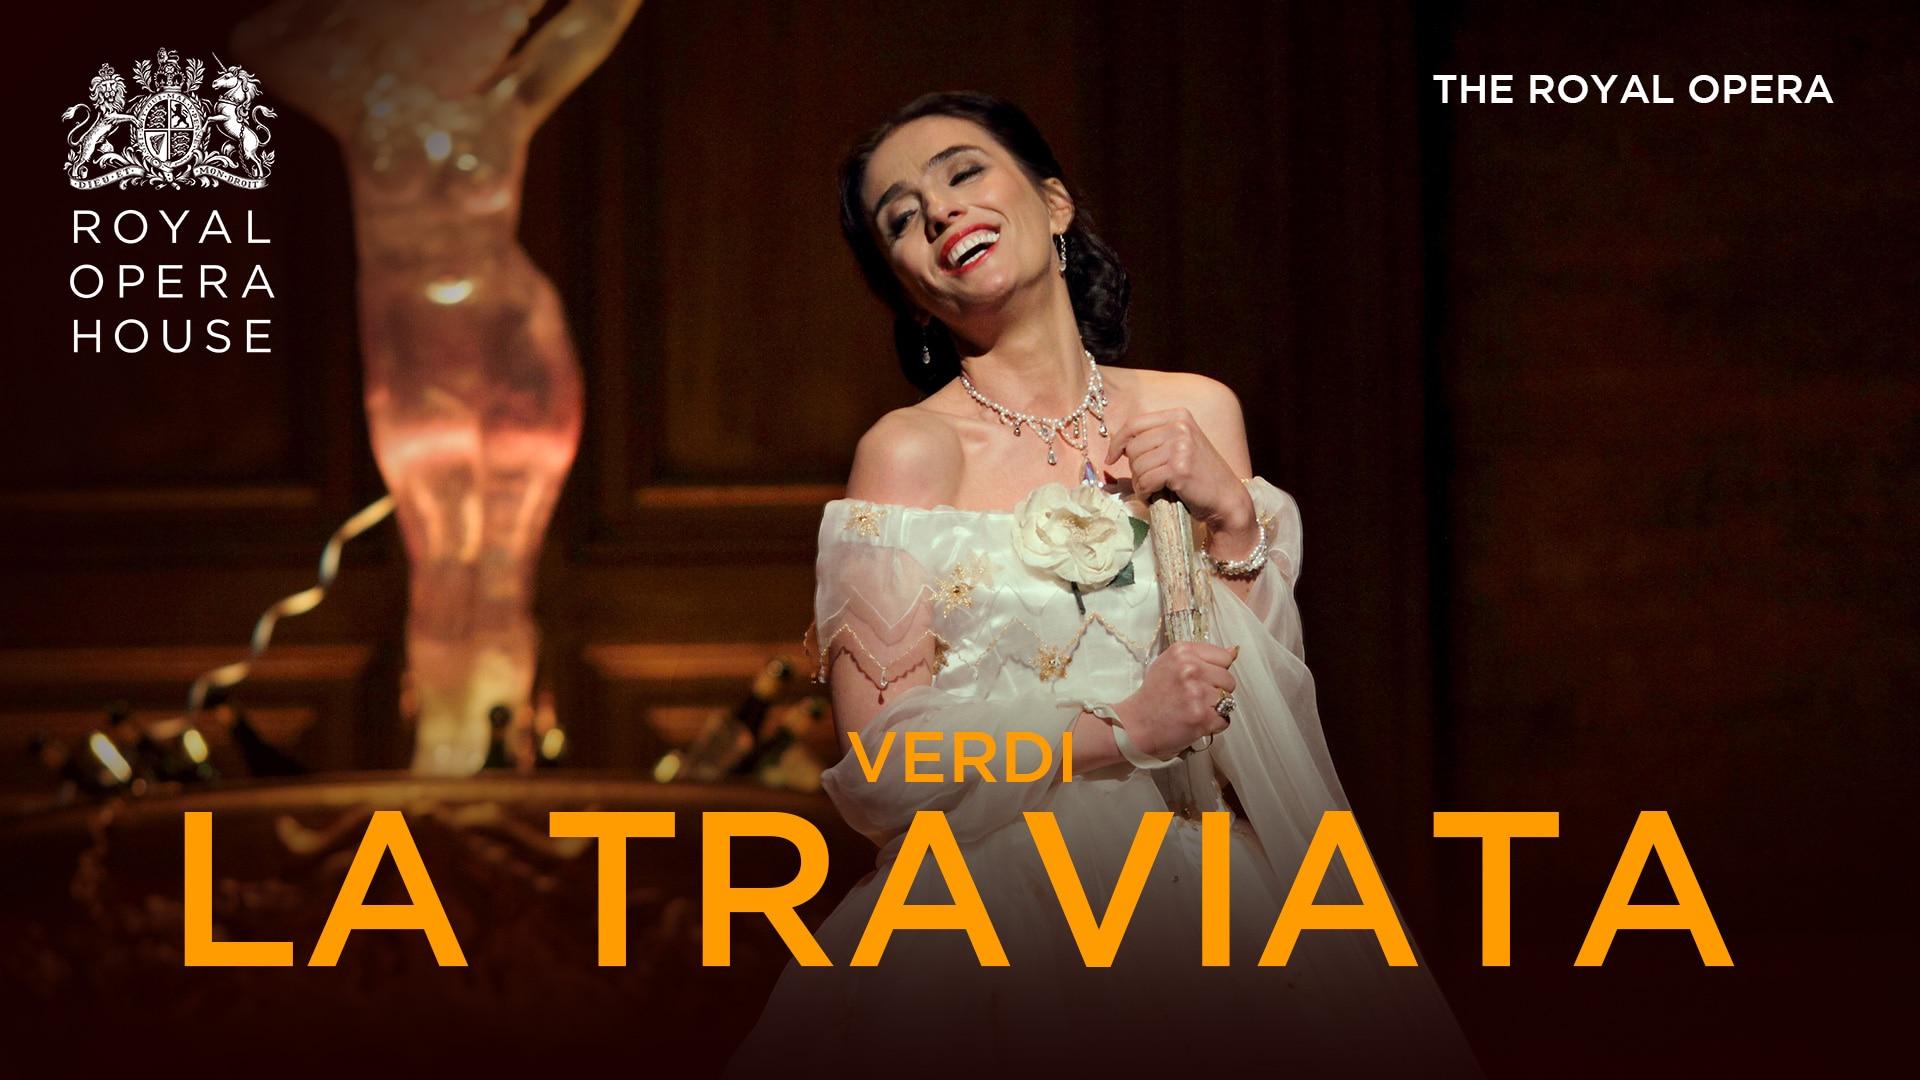 La Traviata - Royal Opera House